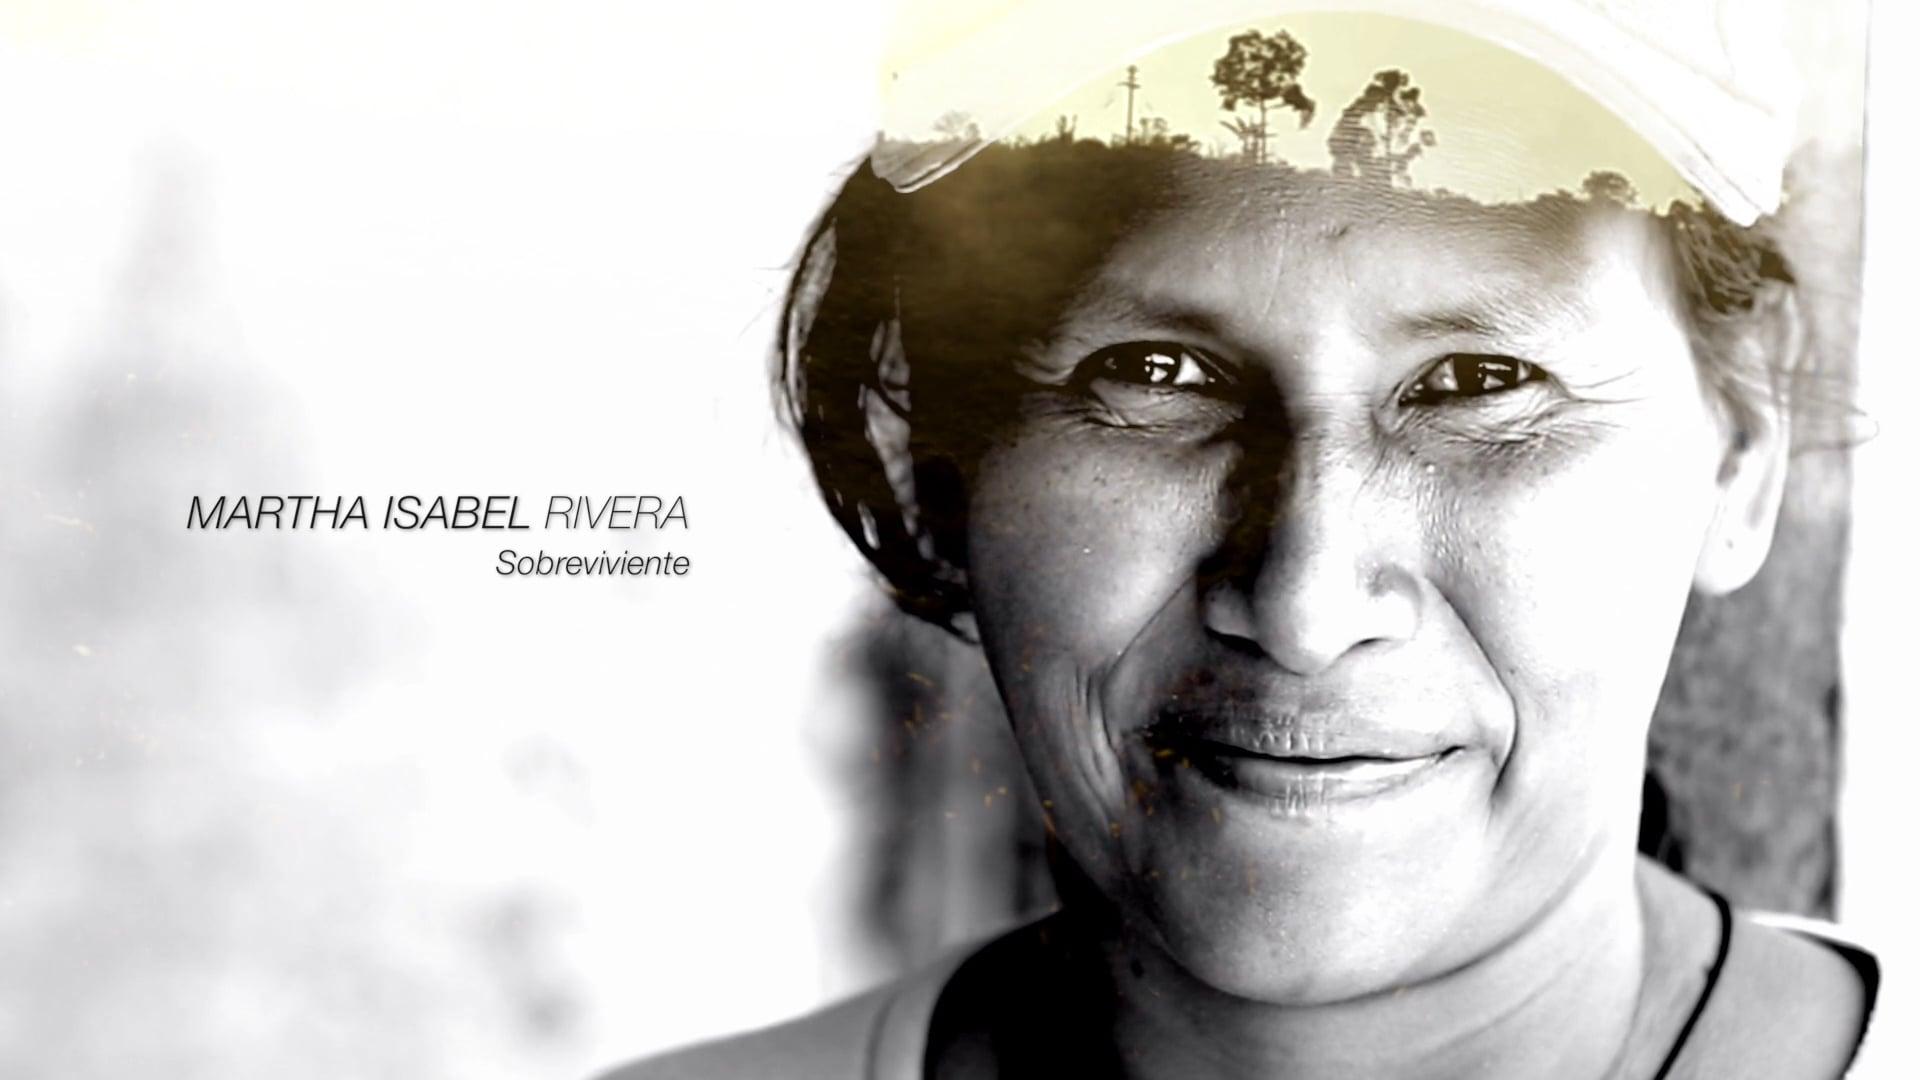 Documentary Vereda Esperanza - Humanity and inclusion